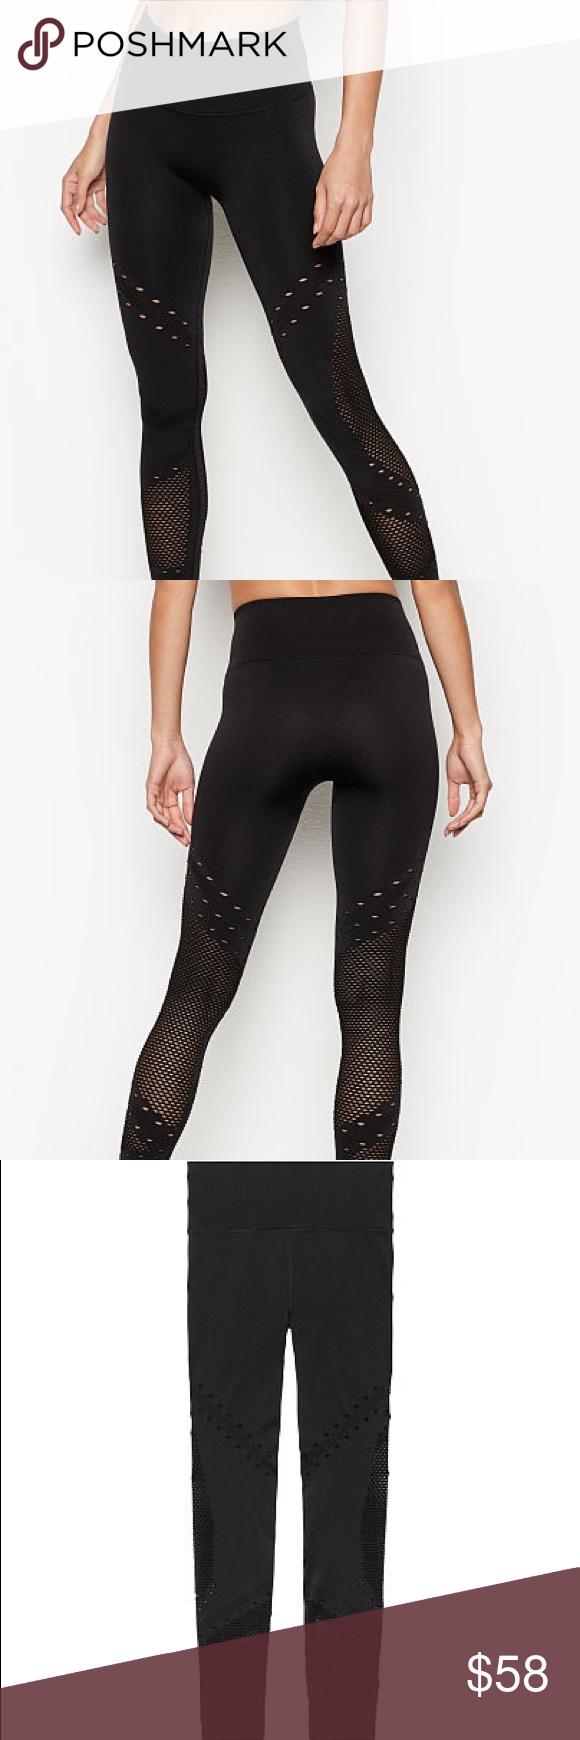 NEW Victoria Secret Sport High Rise Seamless Tights black MEDIUM